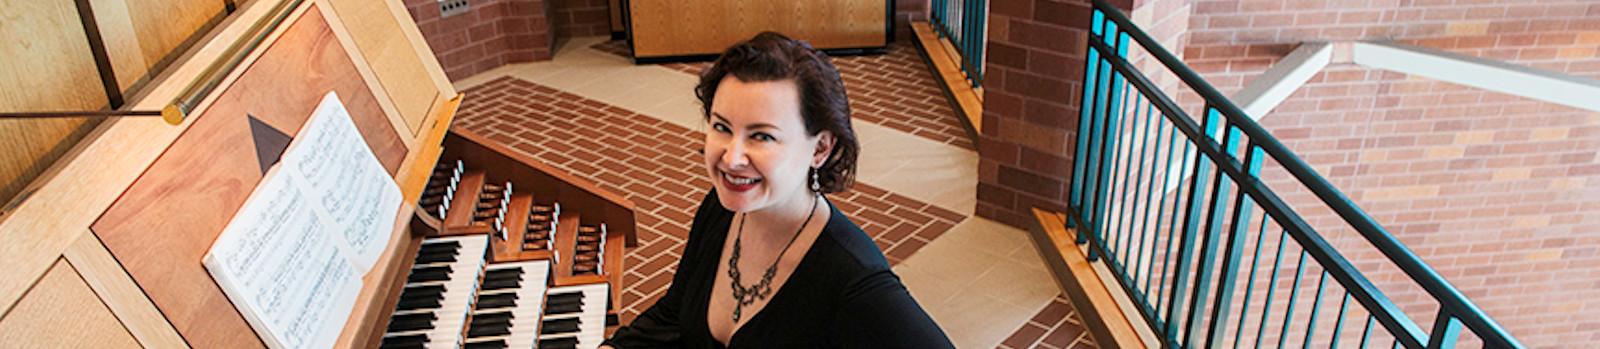 Dr. Damin Spritzer, organ recitalist